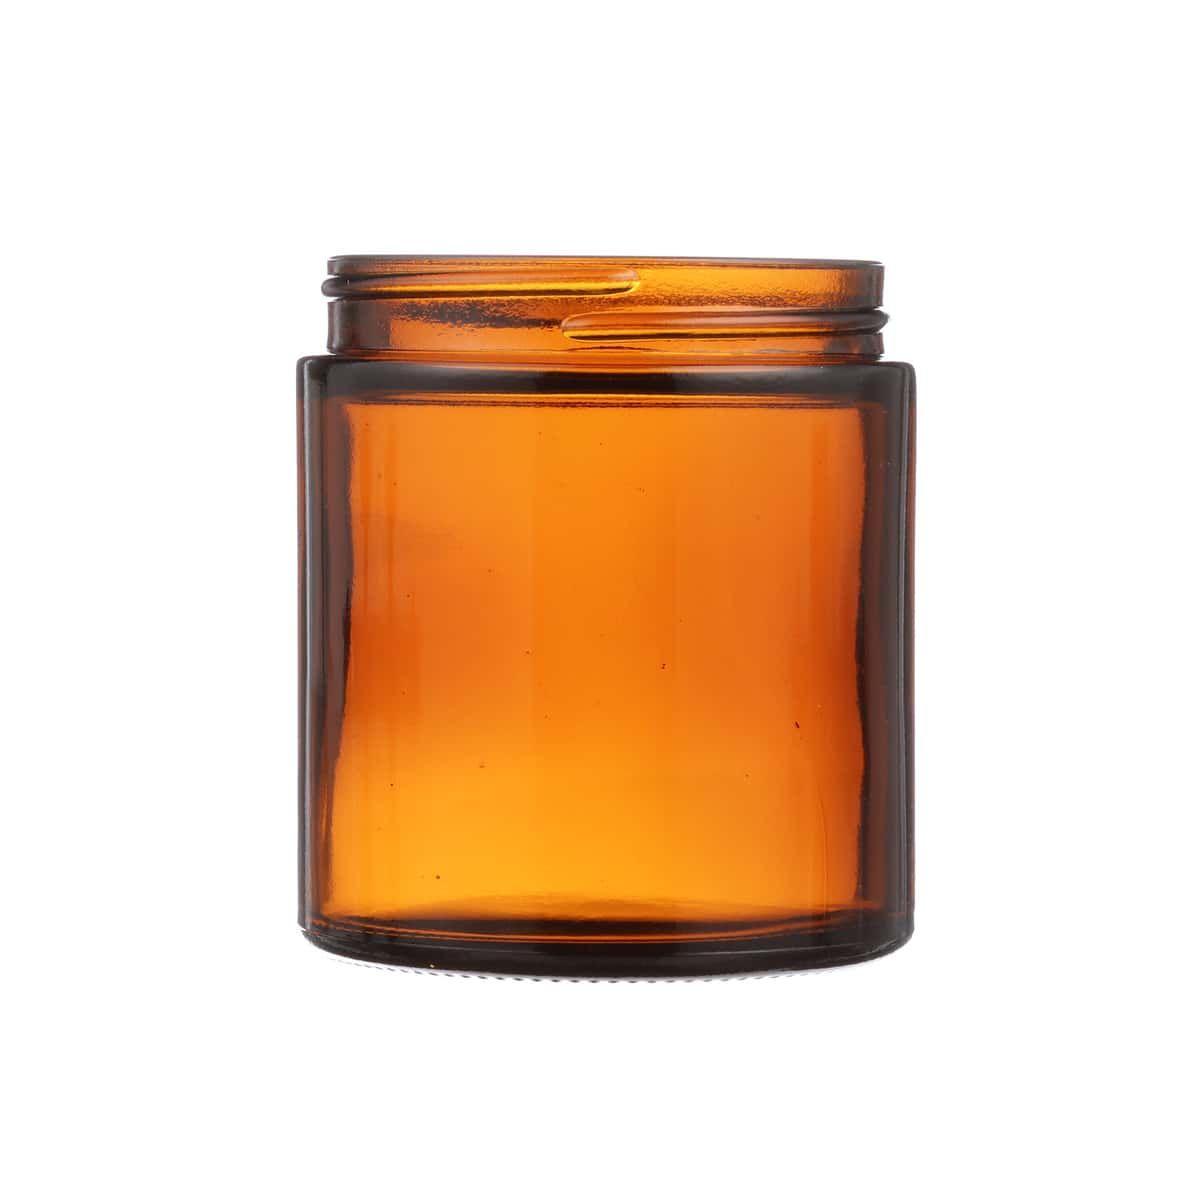 4 Oz Amber Glass Round Salve Jar 58 400 Neck Finish Amber Glass Amber Glass Jars Glass Jars